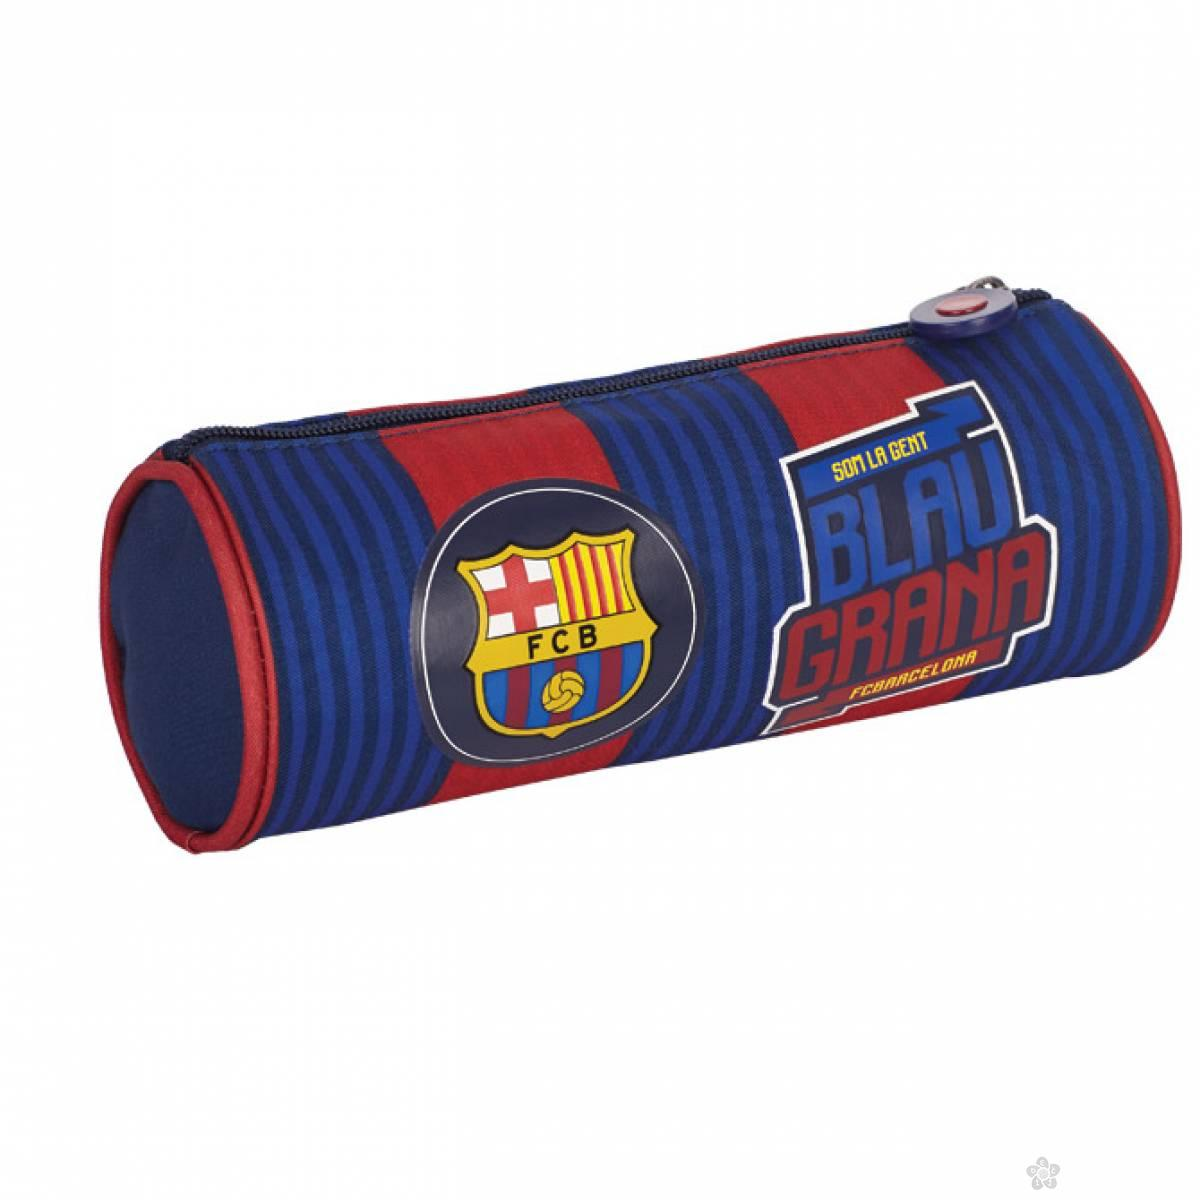 Okrugla pernica FC Barcelona 1 zip FC-137 Astra